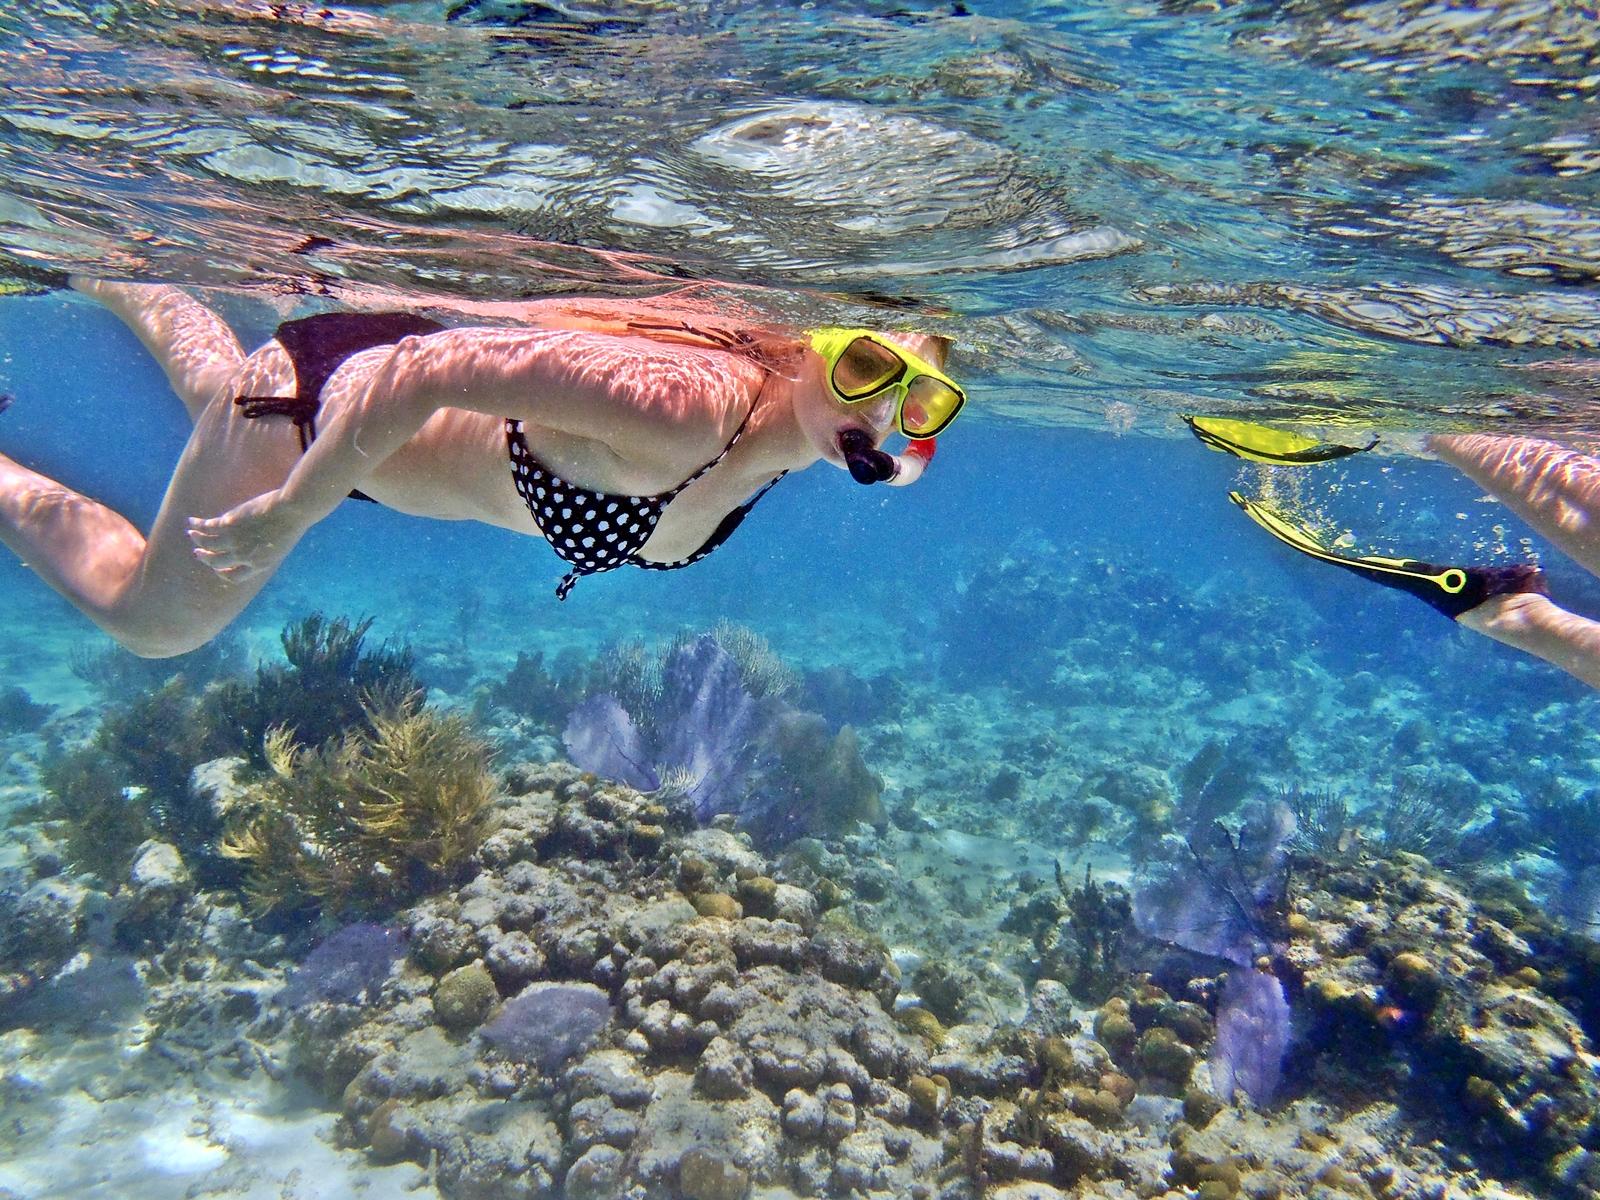 Image courtesy of Bali Hello Travel